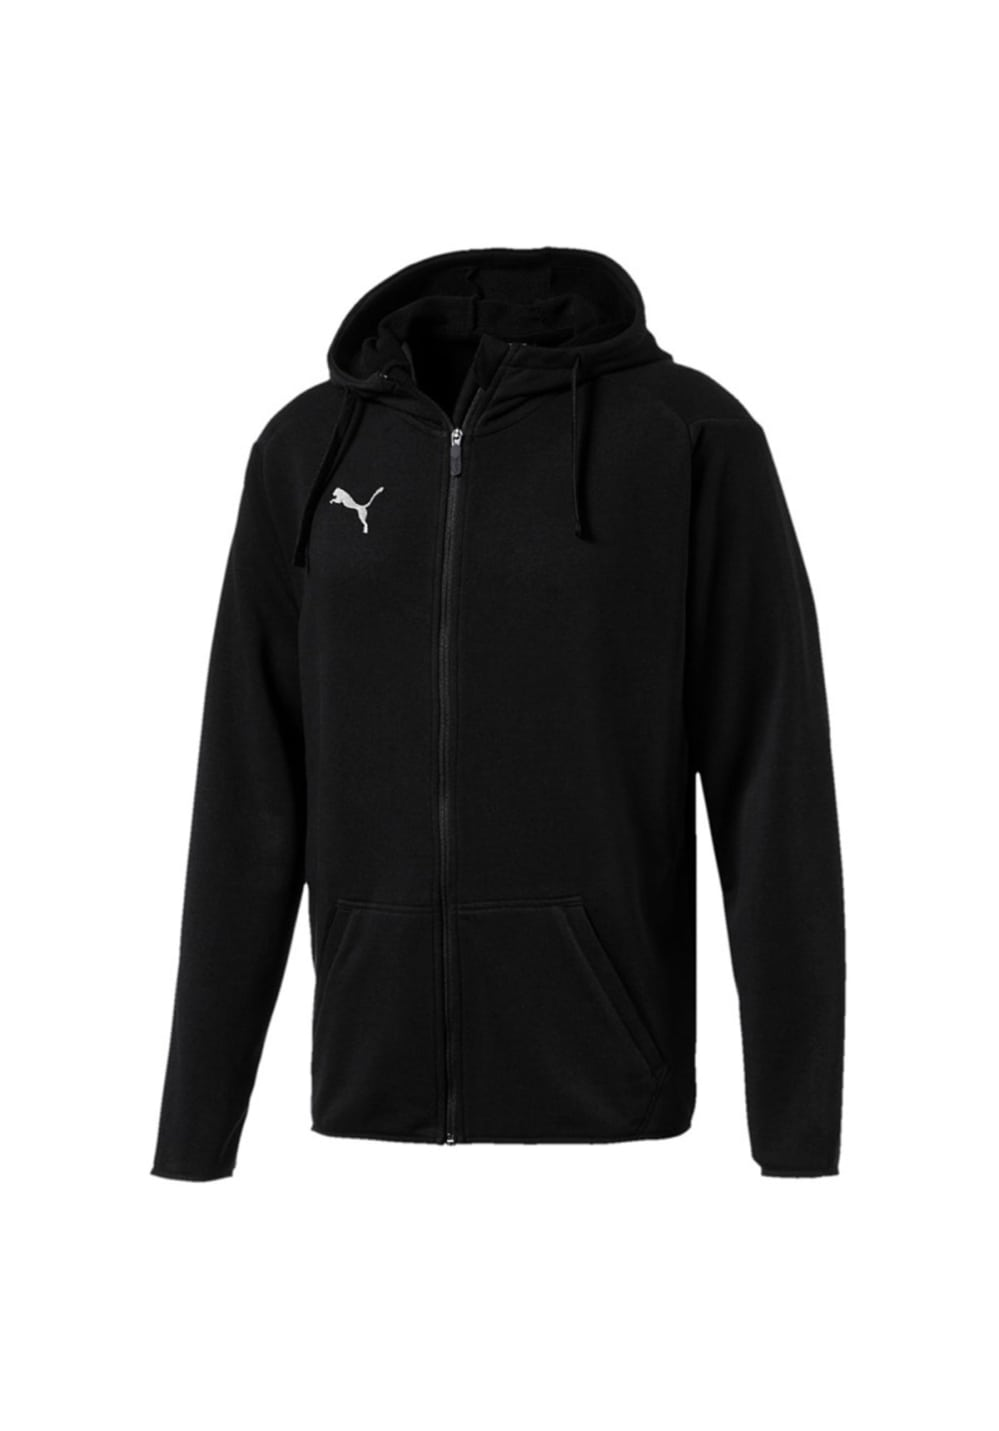 Jacket Homme Casual Loisir Habillement Hoody Pour Noir Puma Liga O5tq0wnx4P